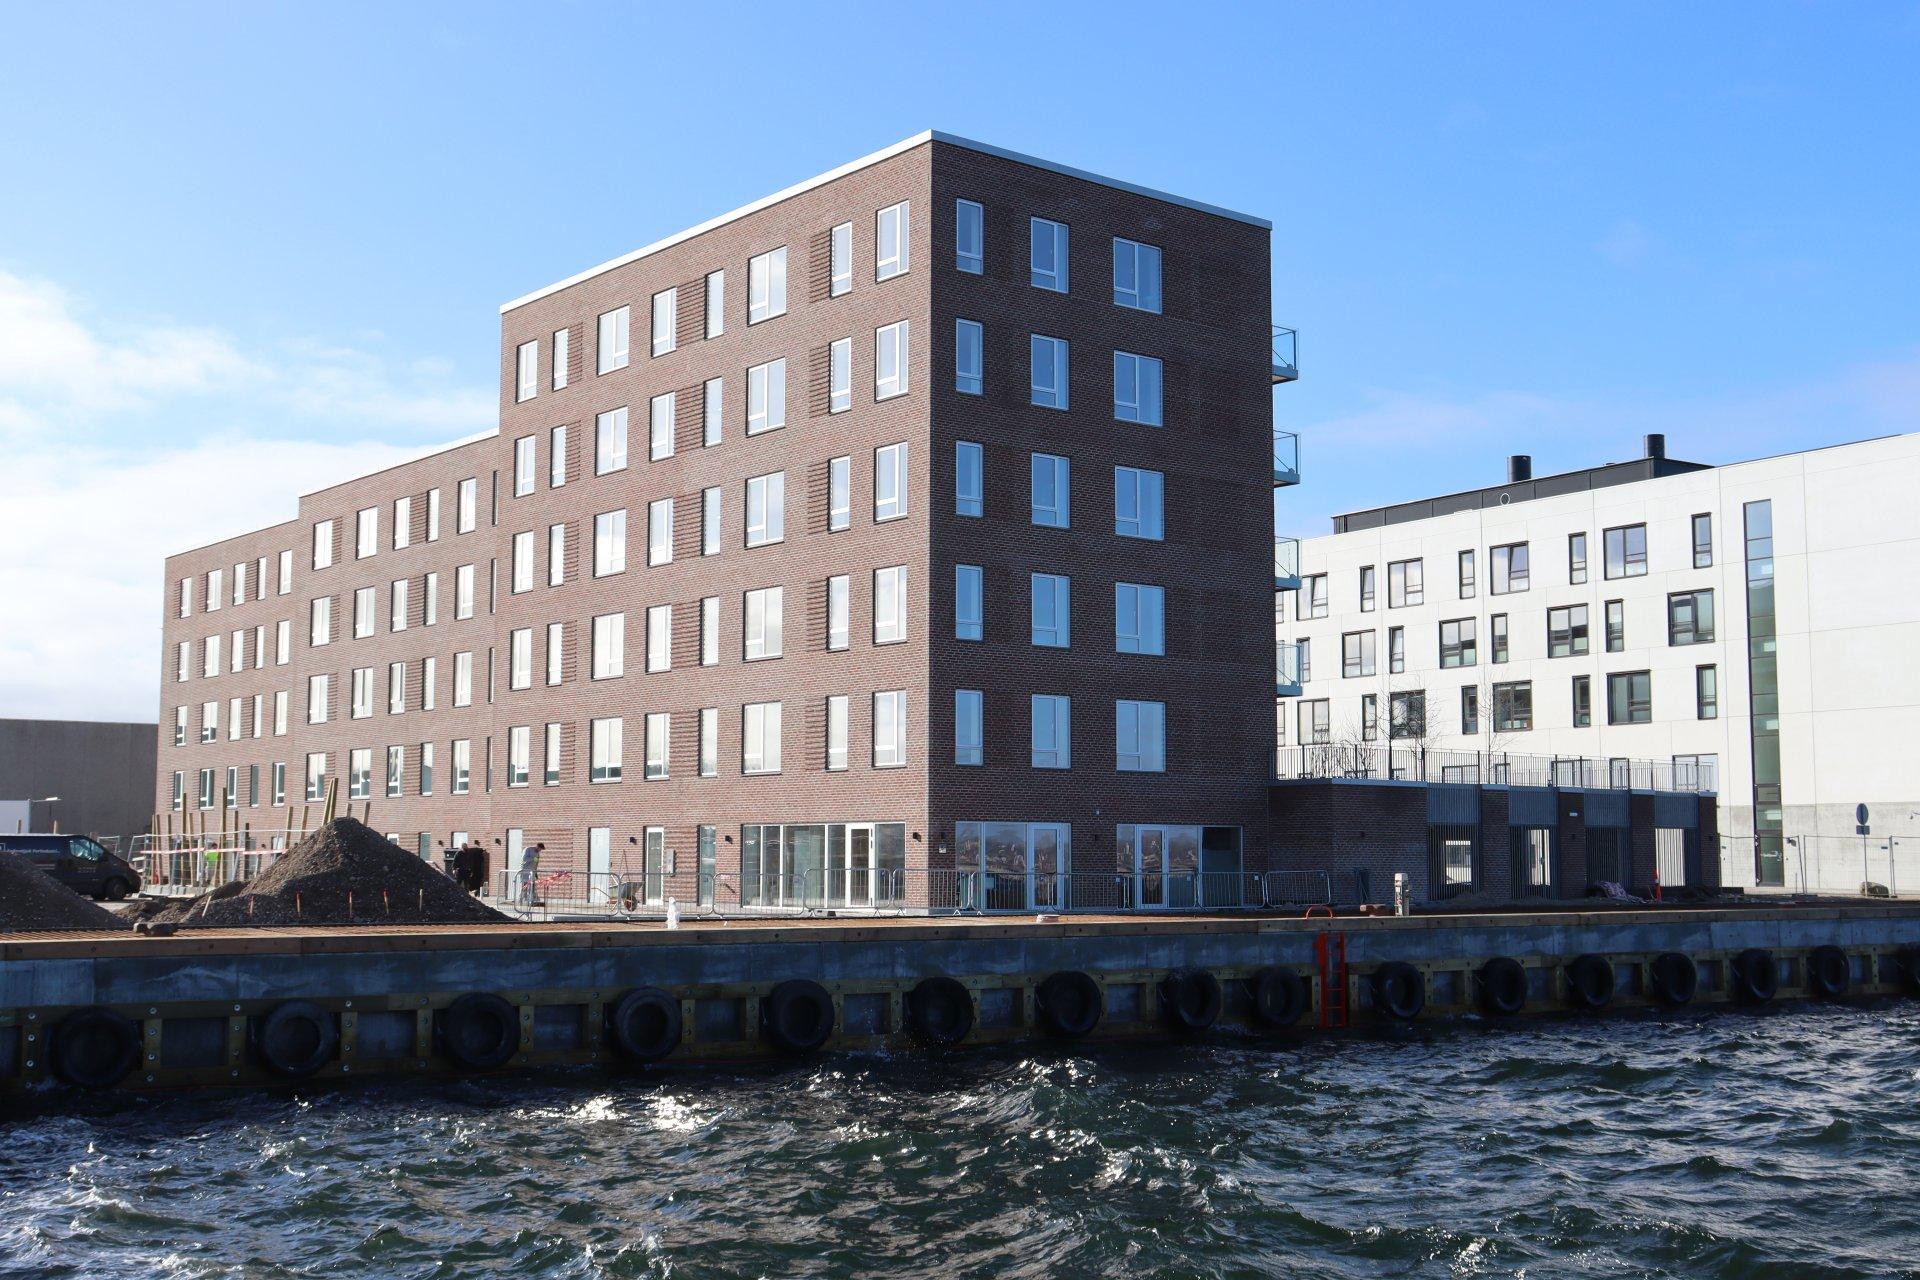 Øst- og Vestbryggen i Holbæk | Reference | Holbøll A/S